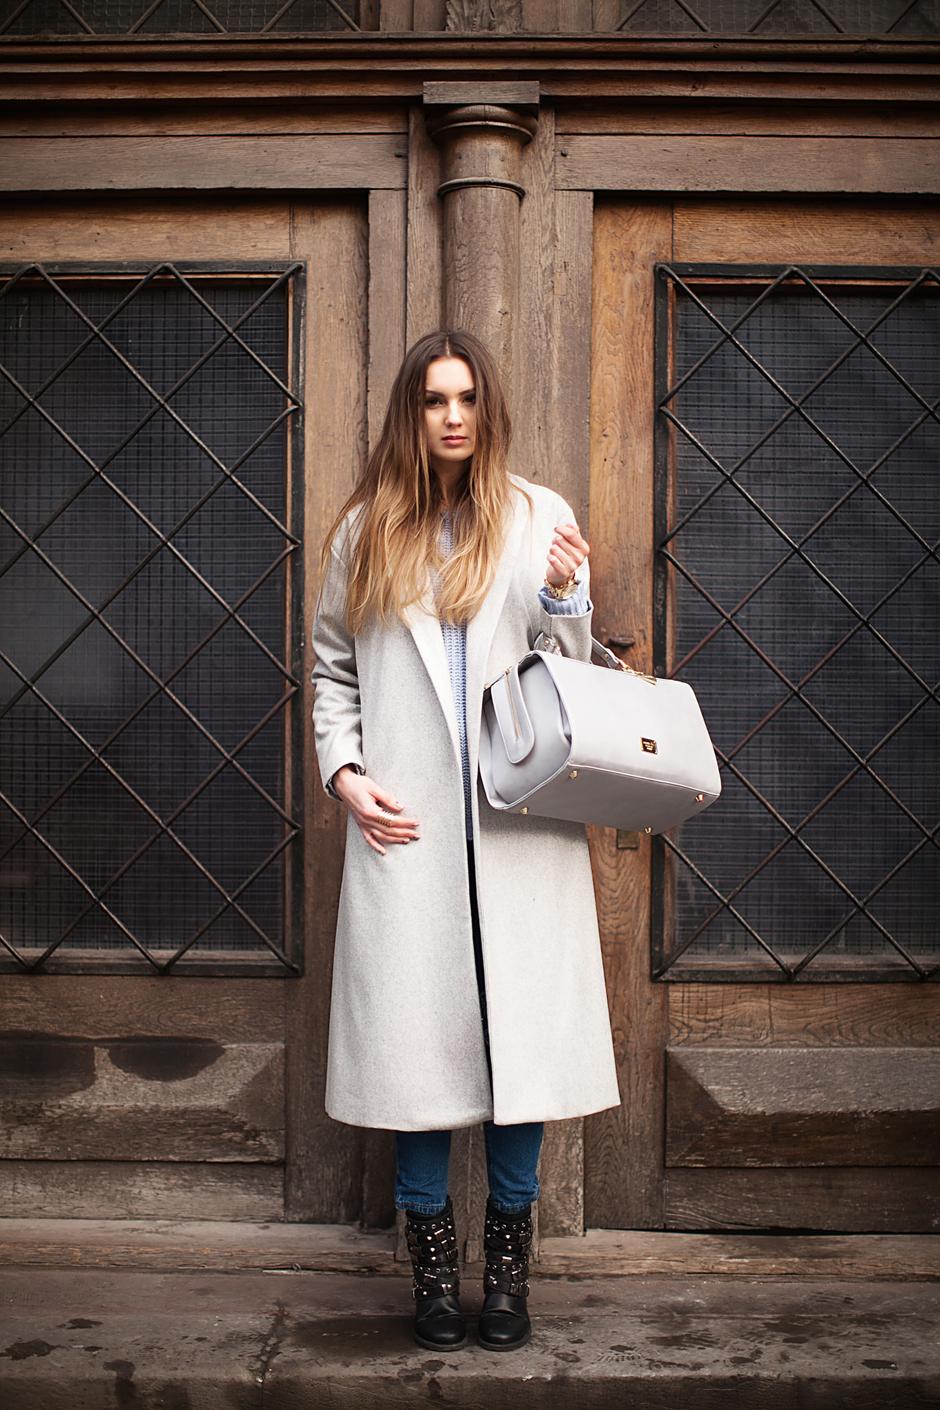 street-style-mom-jeans-gray-coat